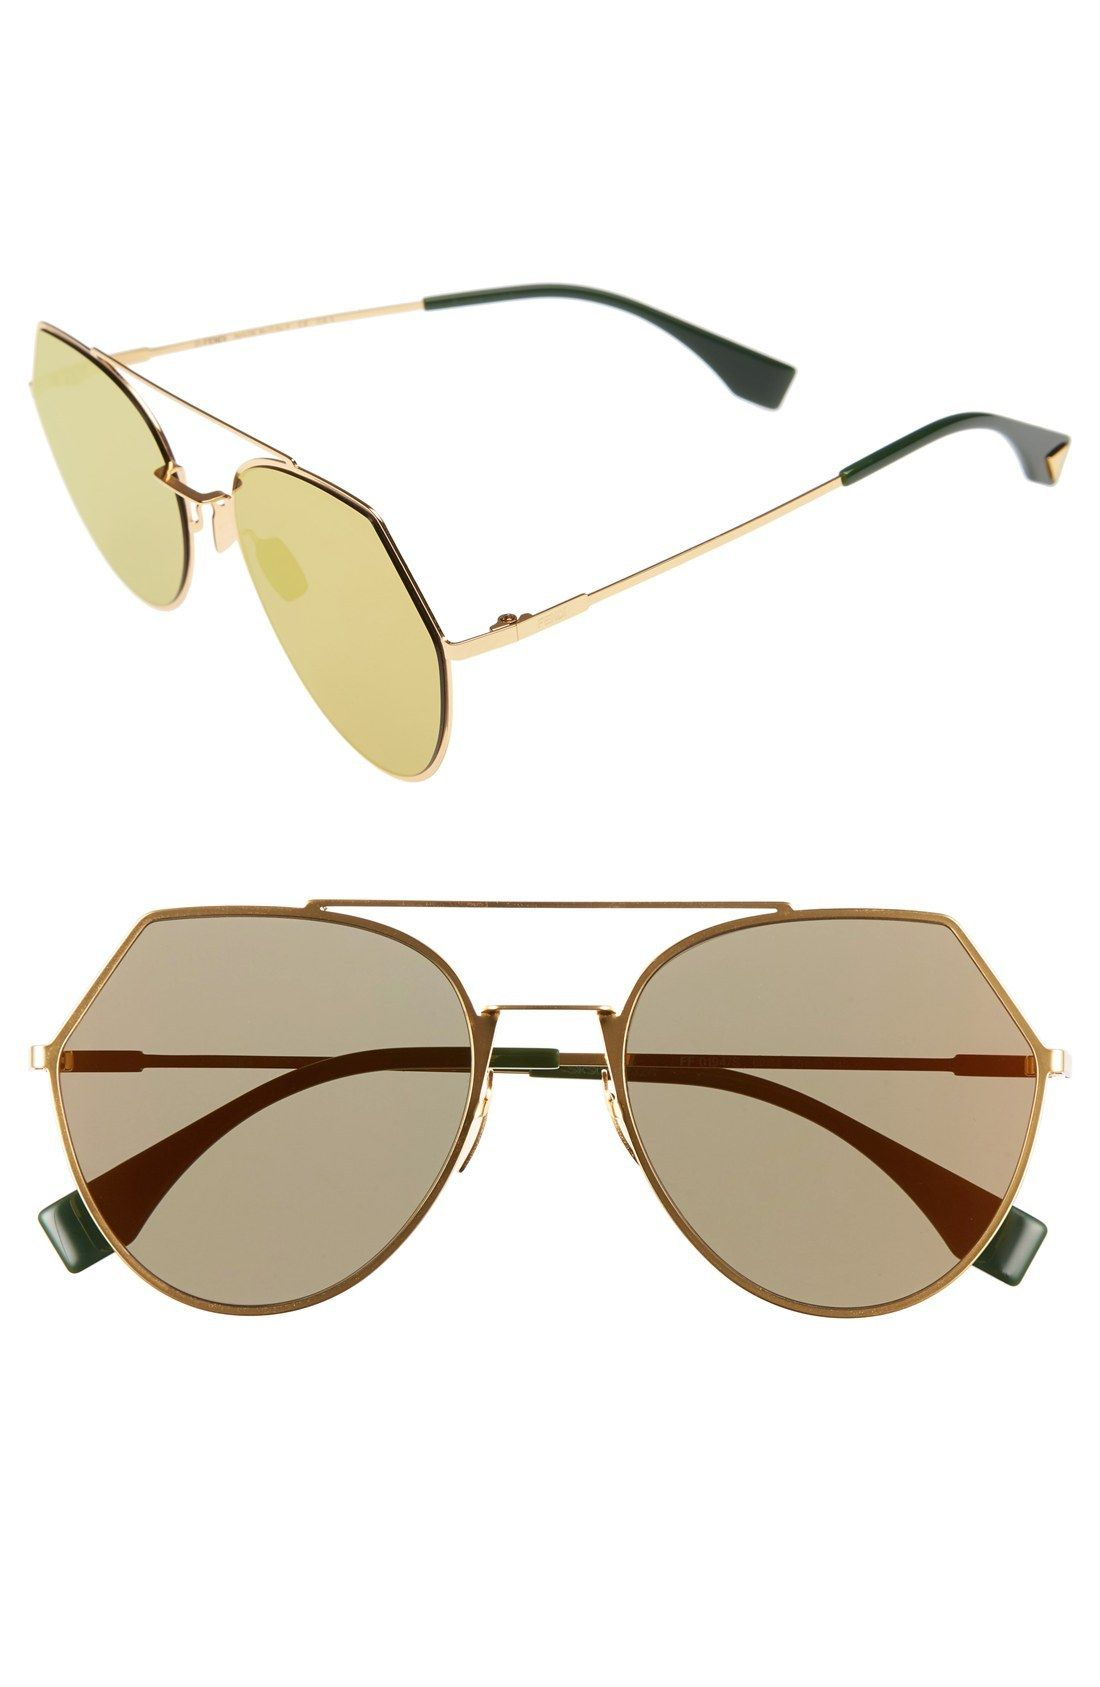 532538f2509 FENDI Ff 0194 3Yg Light Gold Eyeline Aviator Sunglasses